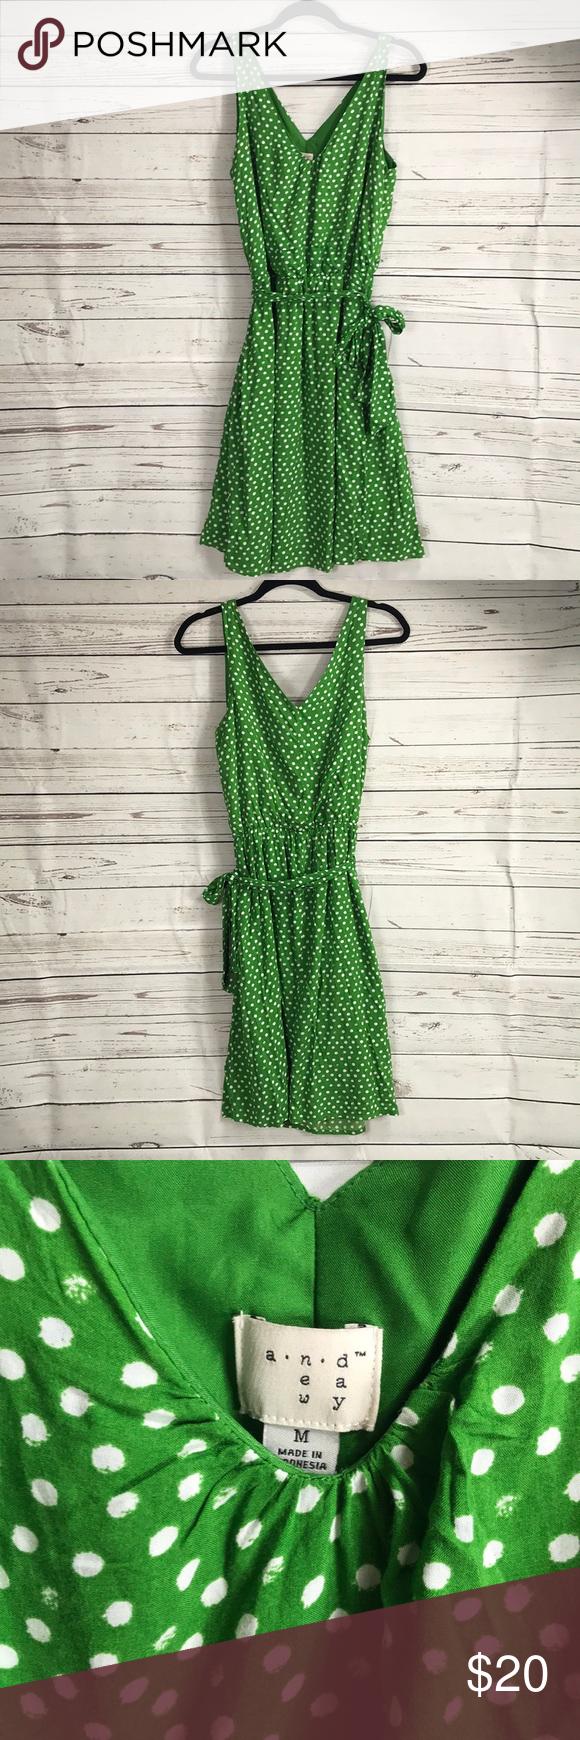 A New Day Target Green Midi Dress Clothes Design Green Midi Dress Dresses [ 1740 x 580 Pixel ]